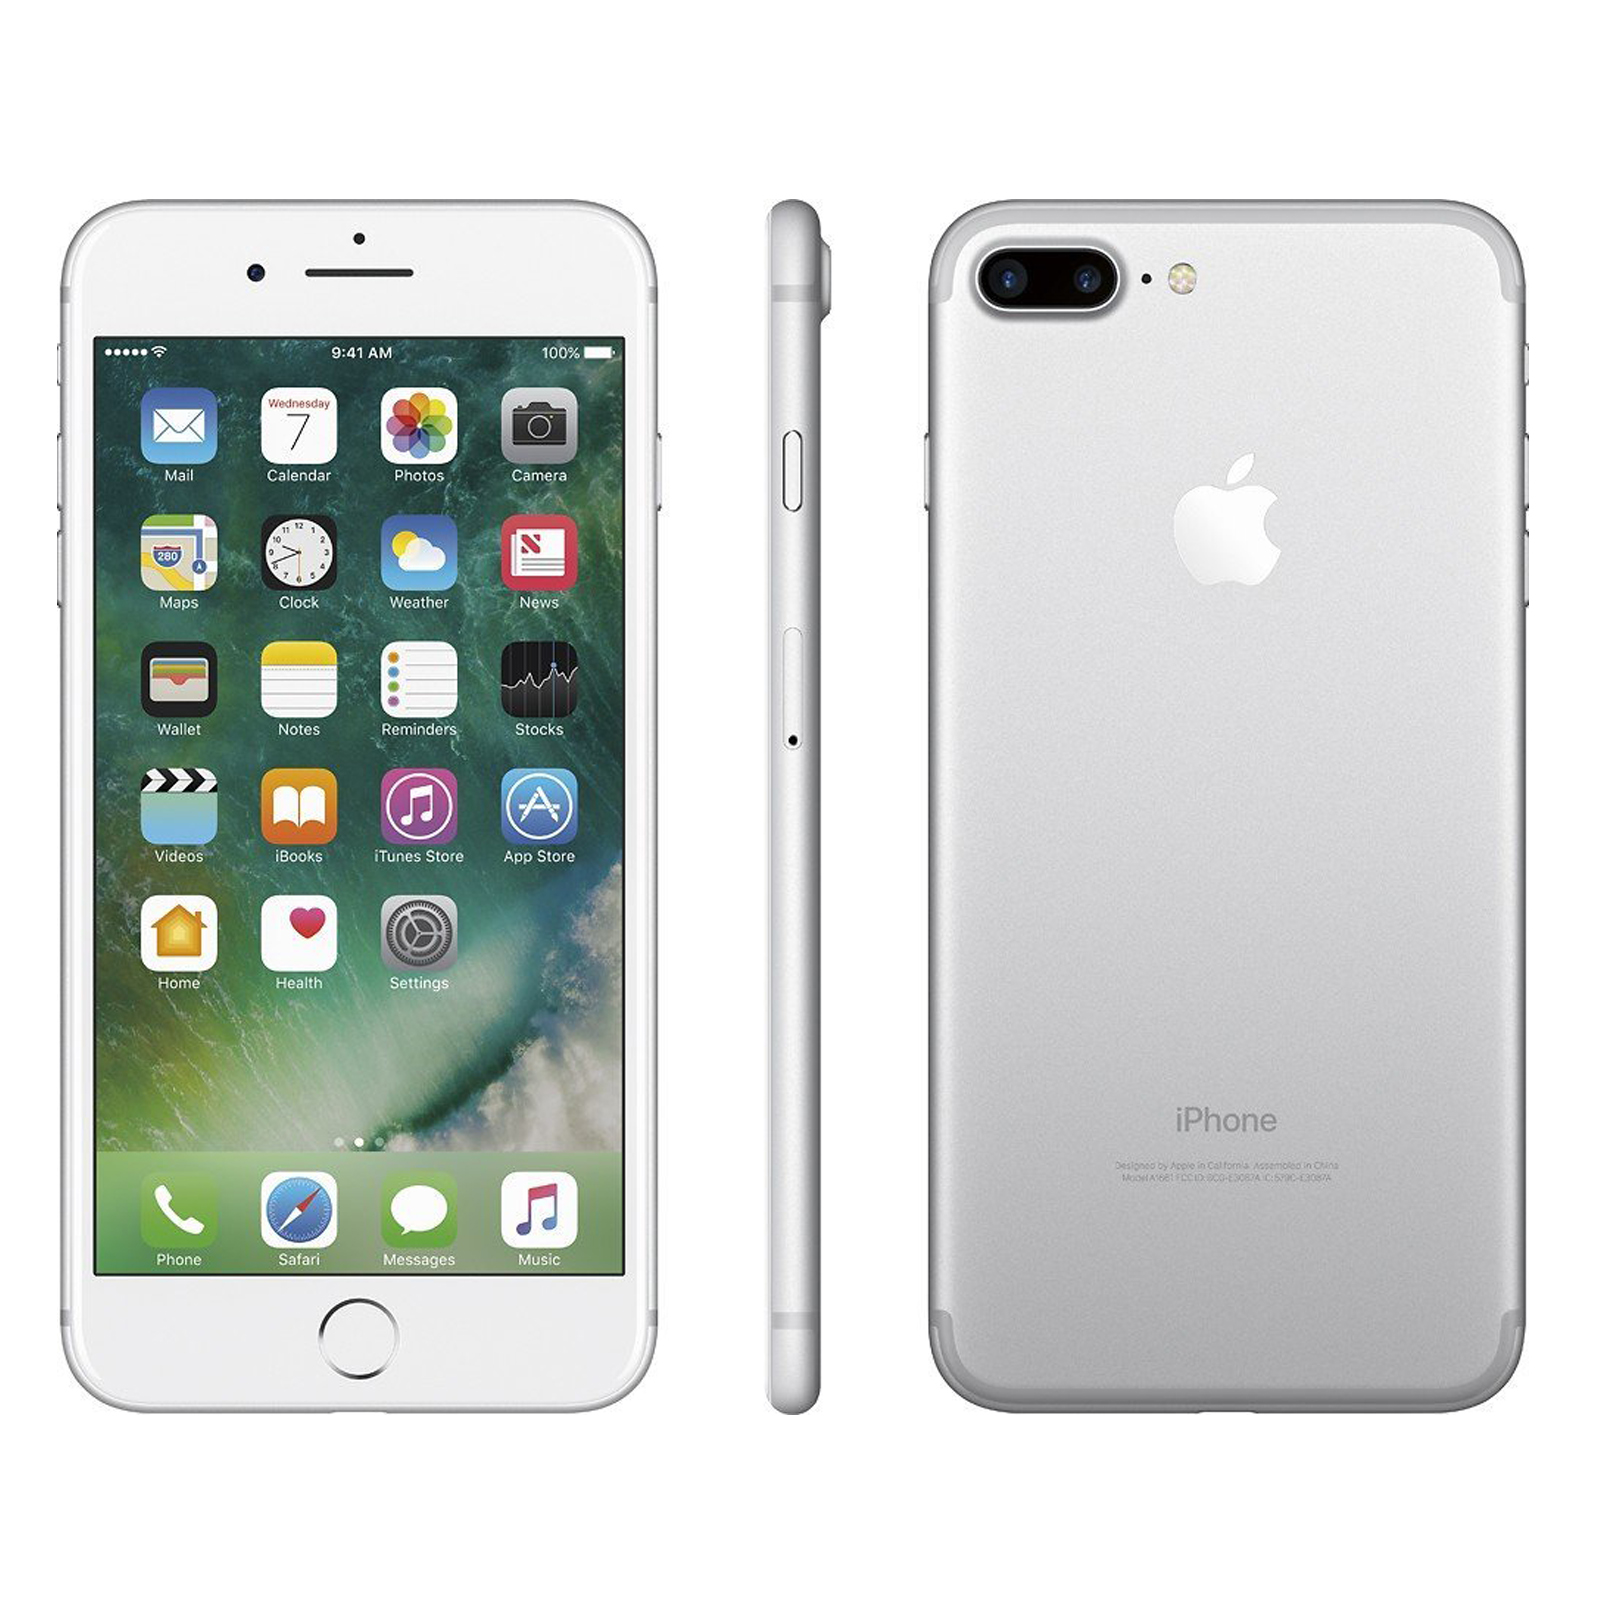 Apple-iPhone-7-Plus-256Go-Argent-SmartPhone-sans-Simlock-5-5-034-Telephones miniature 2